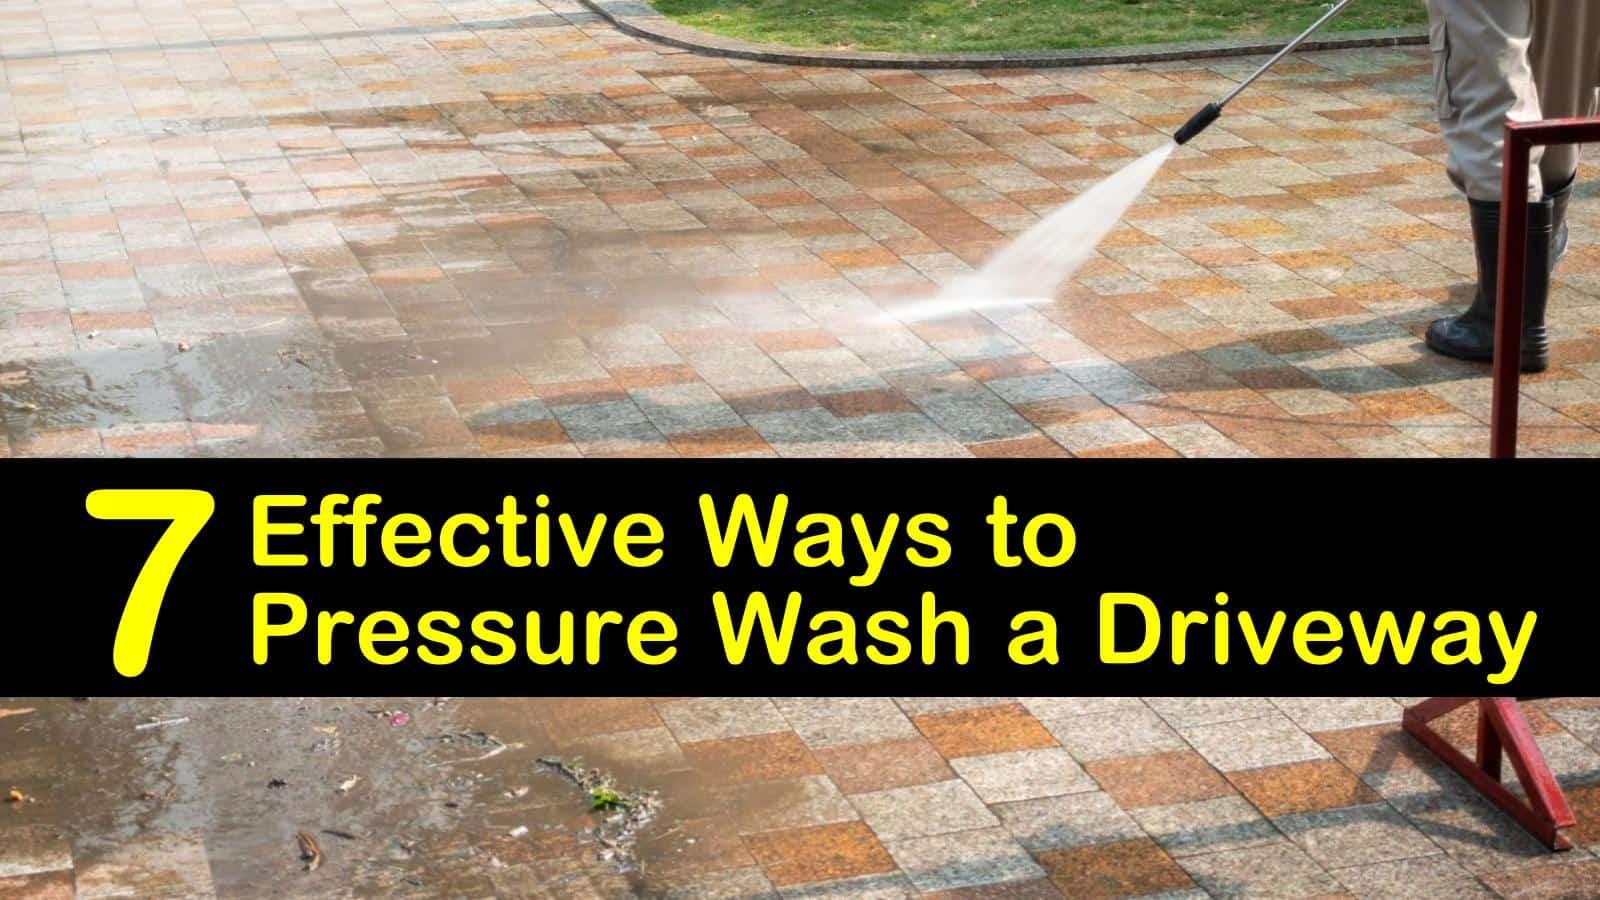 10 Effective Ways to Pressure Wash a Driveway